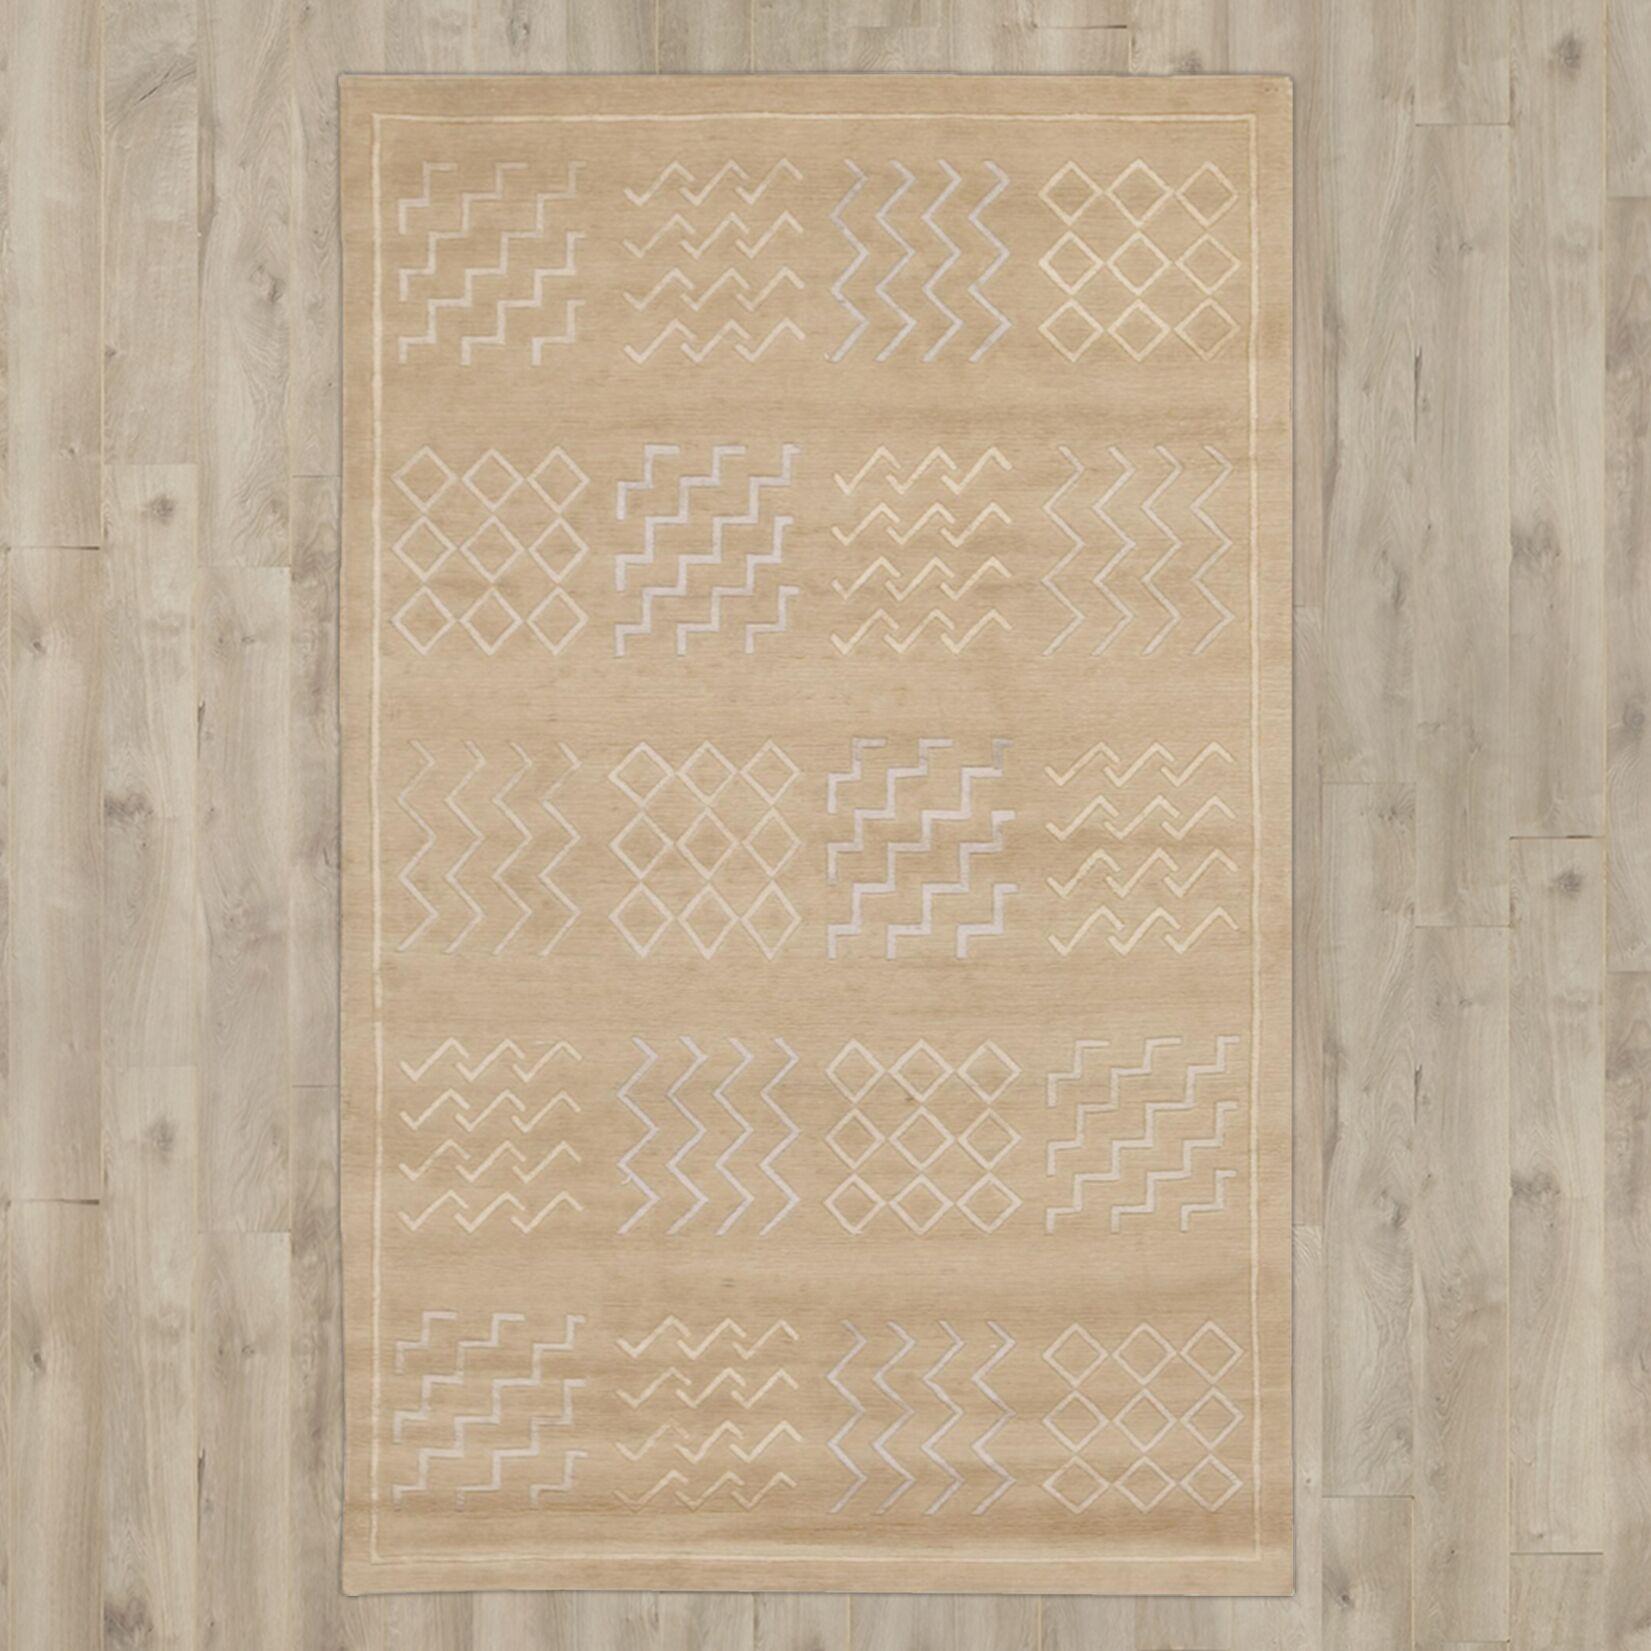 Yelisey Hand-Knotted Beige Area Rug Rug Size: Rectangle 7'9